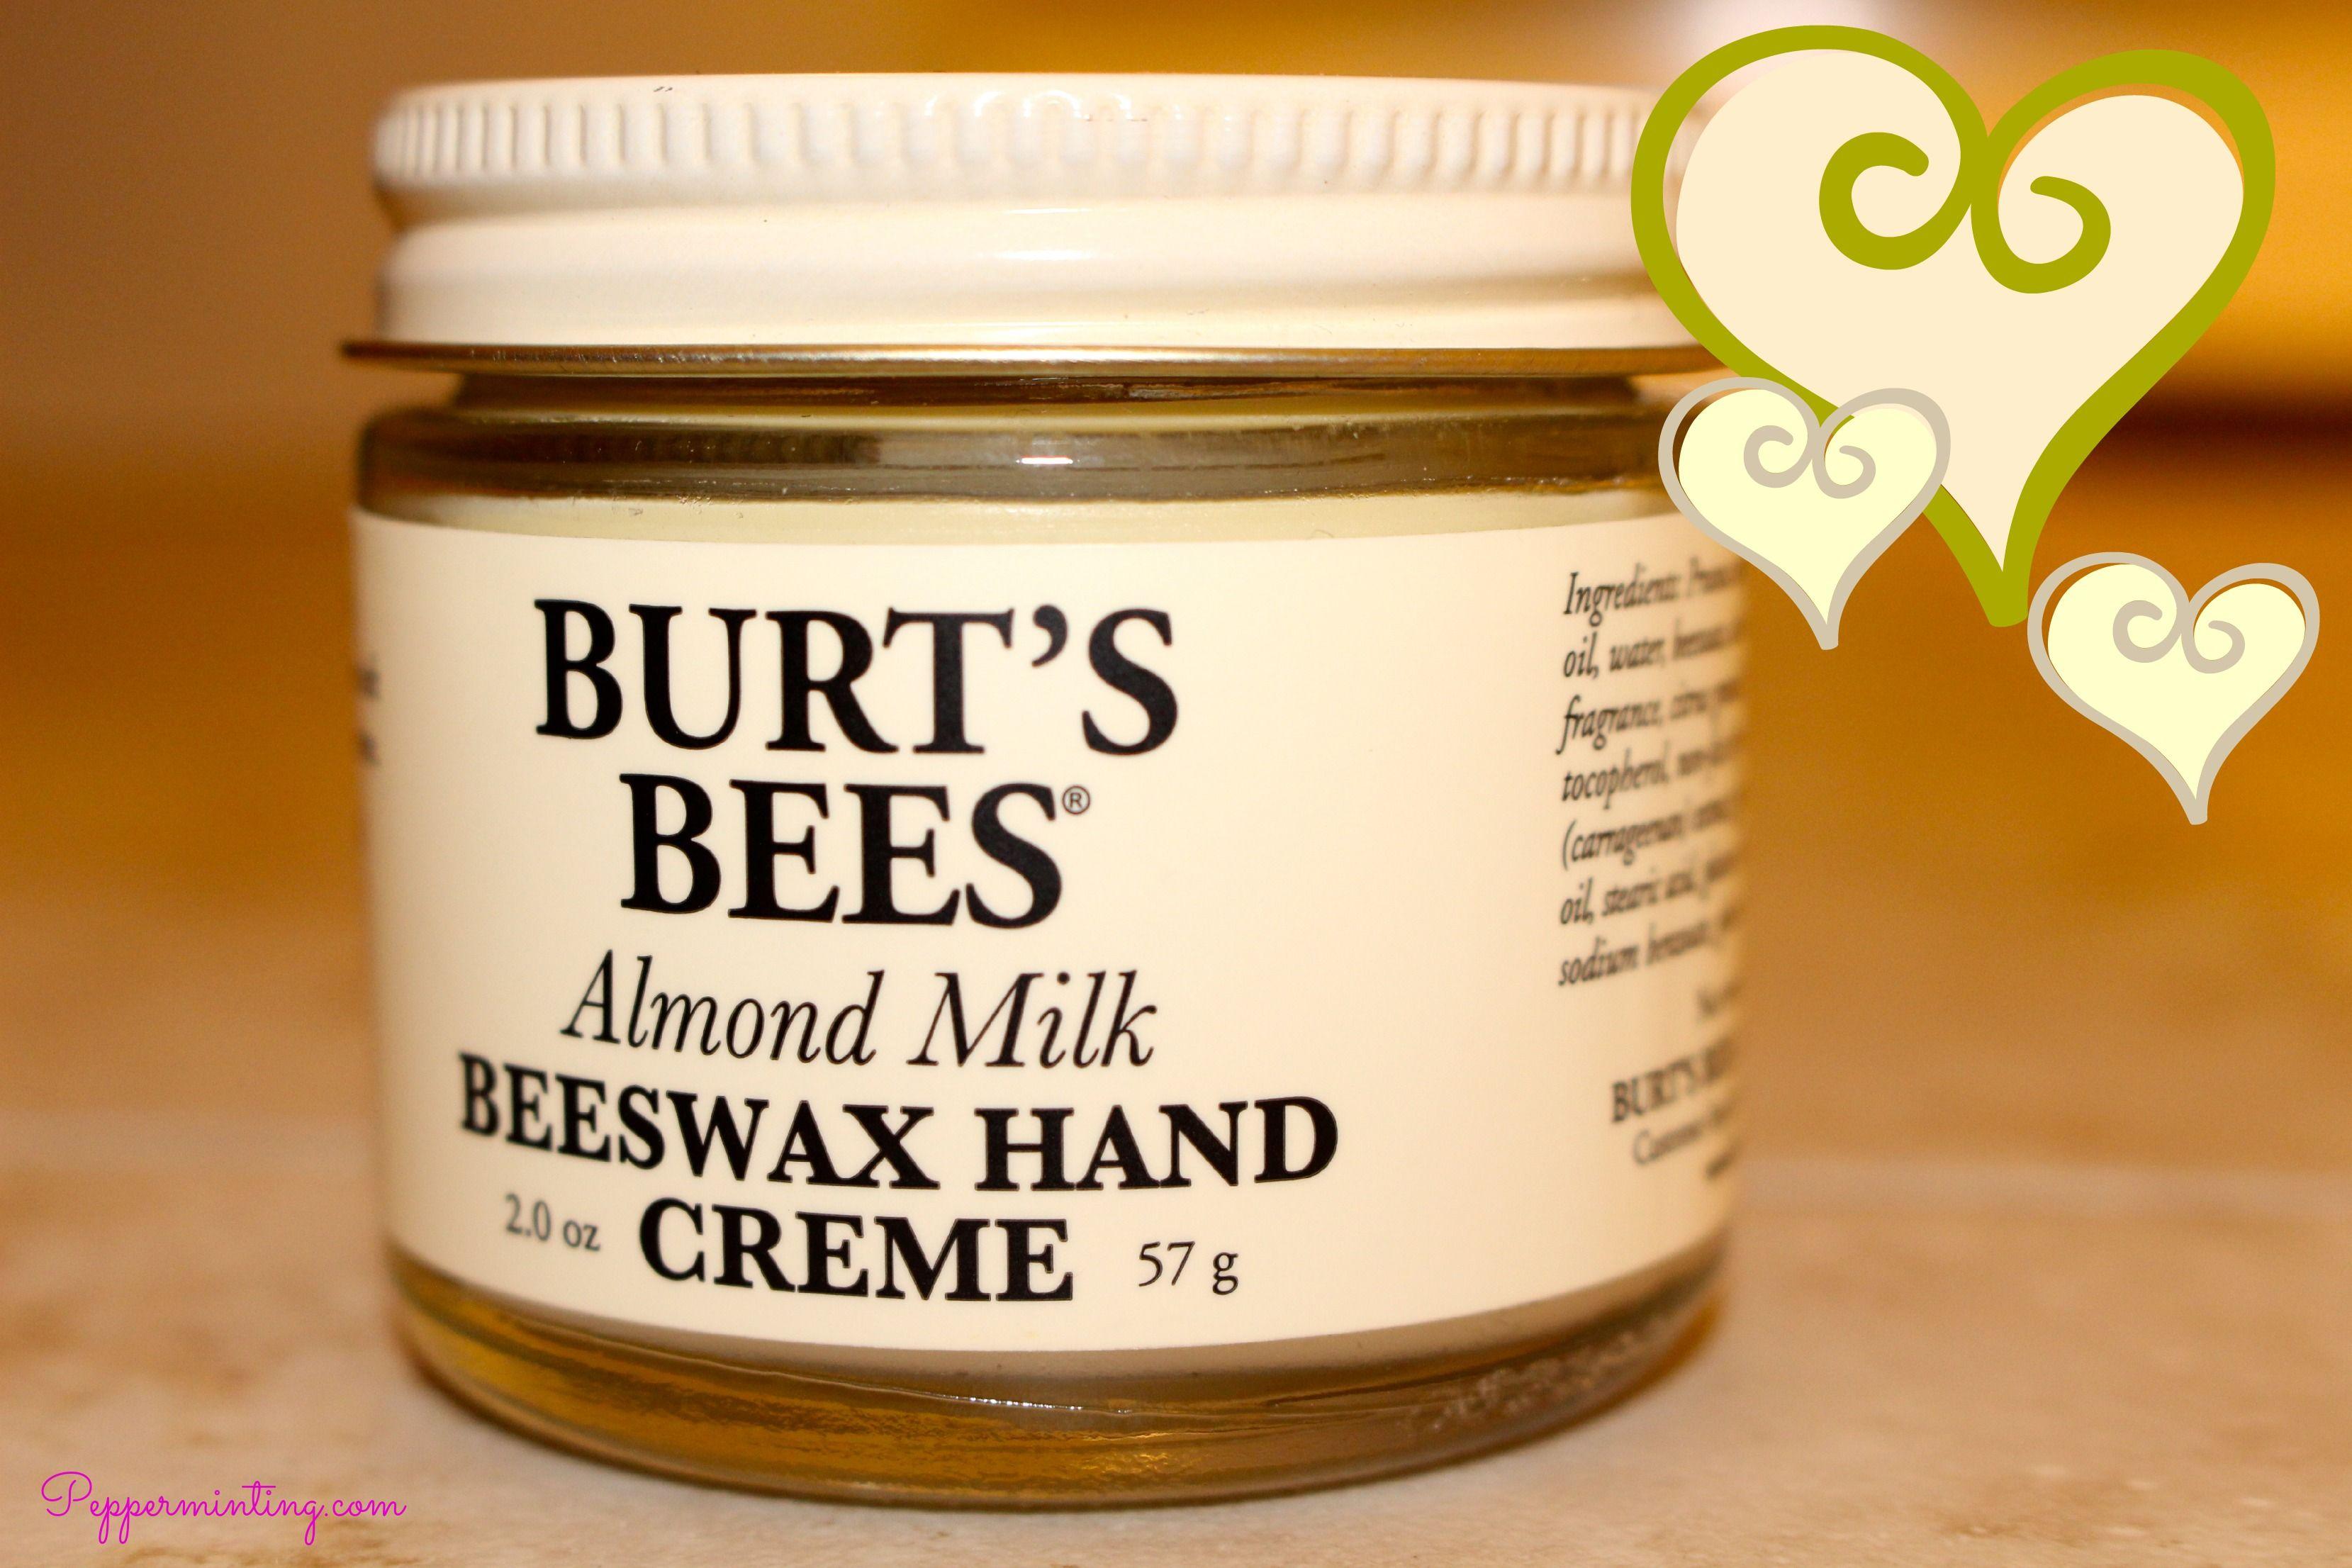 Burts bees almond milk beeswax hand creme diy lotion